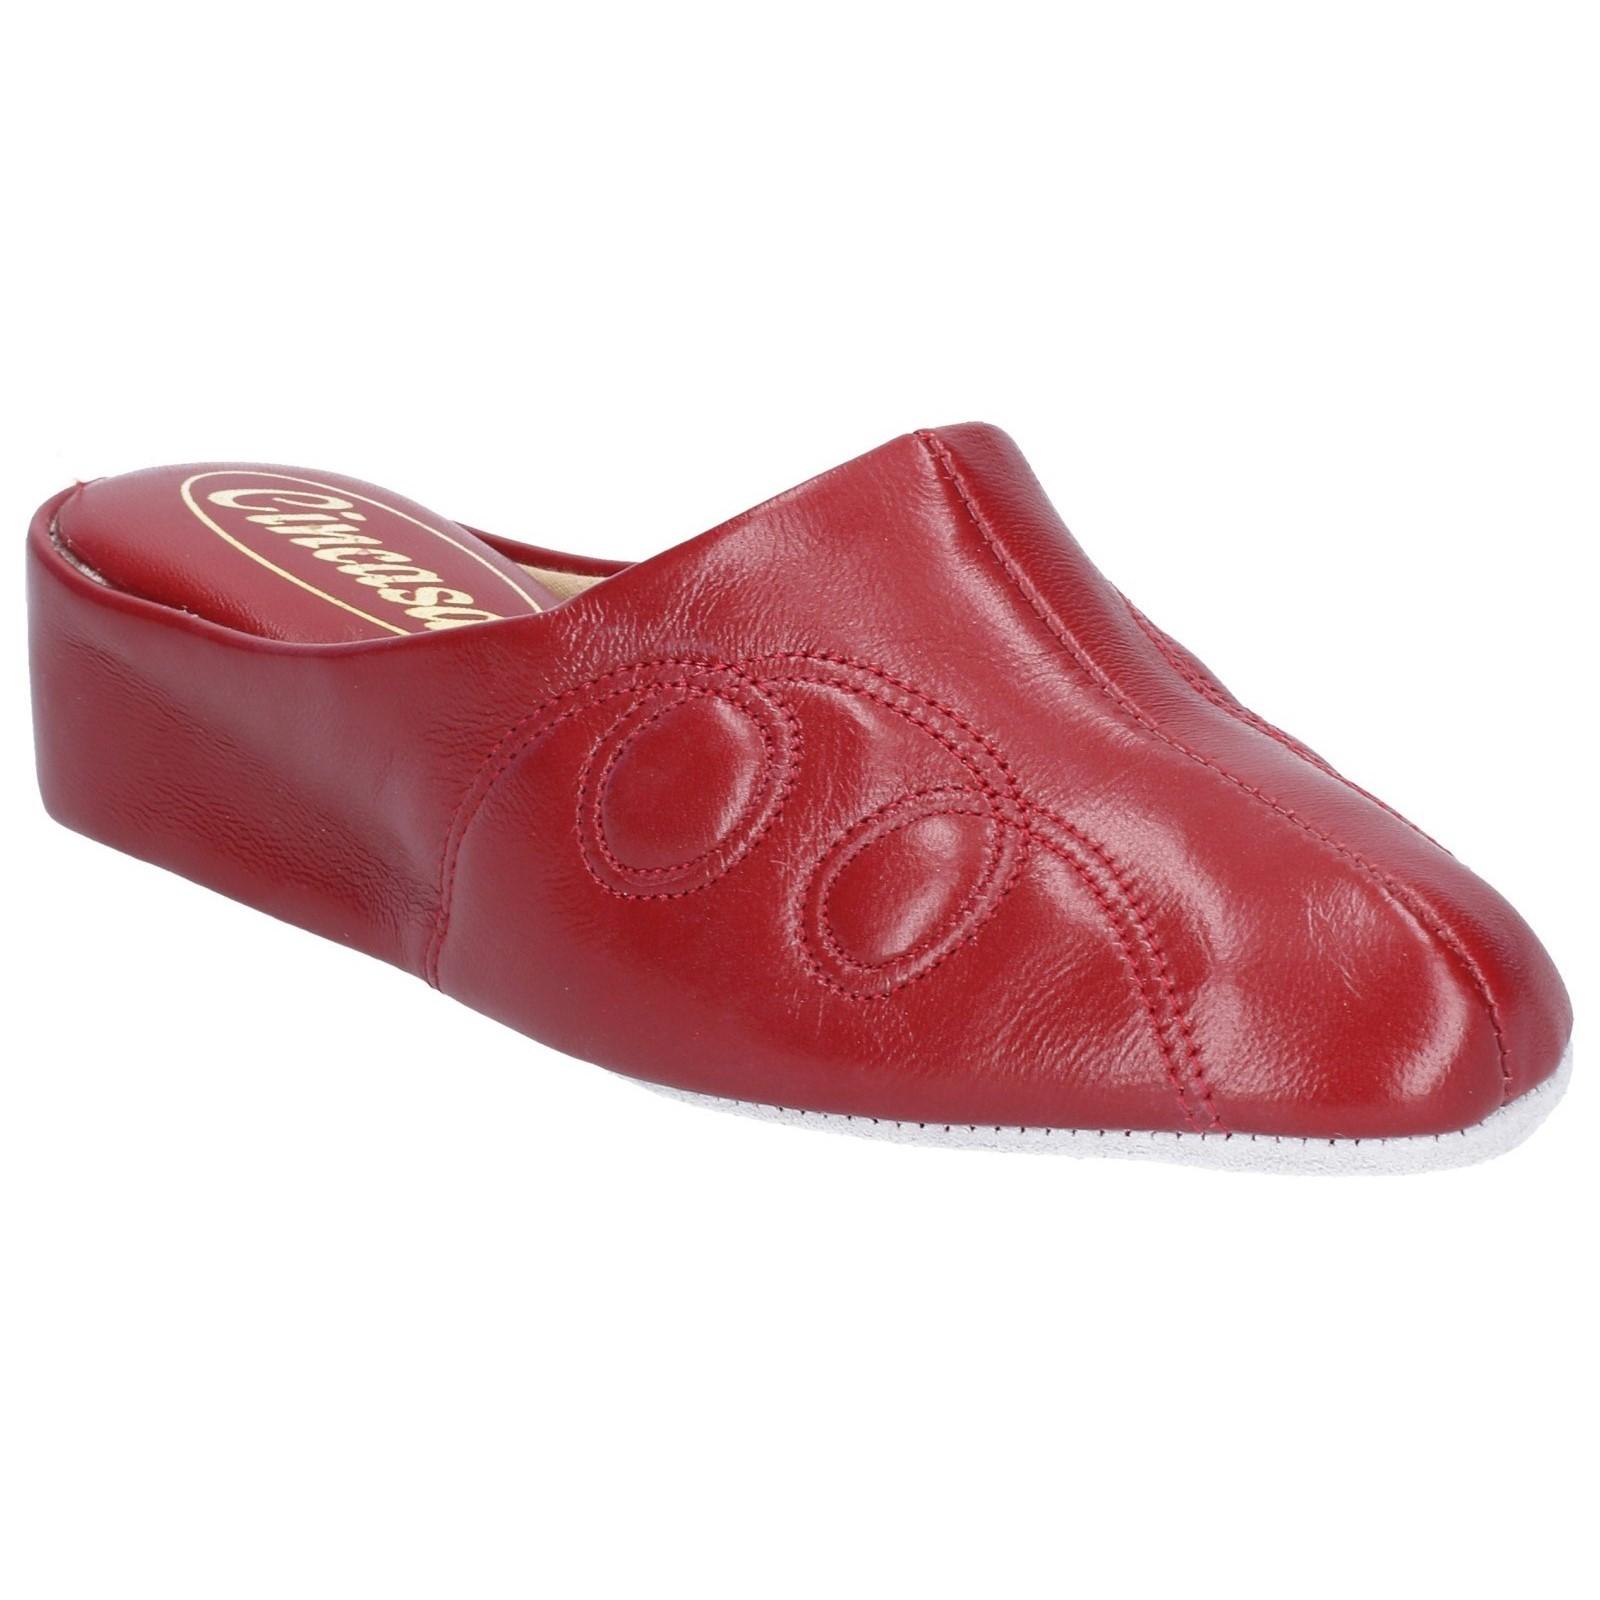 Cincasa LINEA DONNA STIVALI Pantofola Mahon